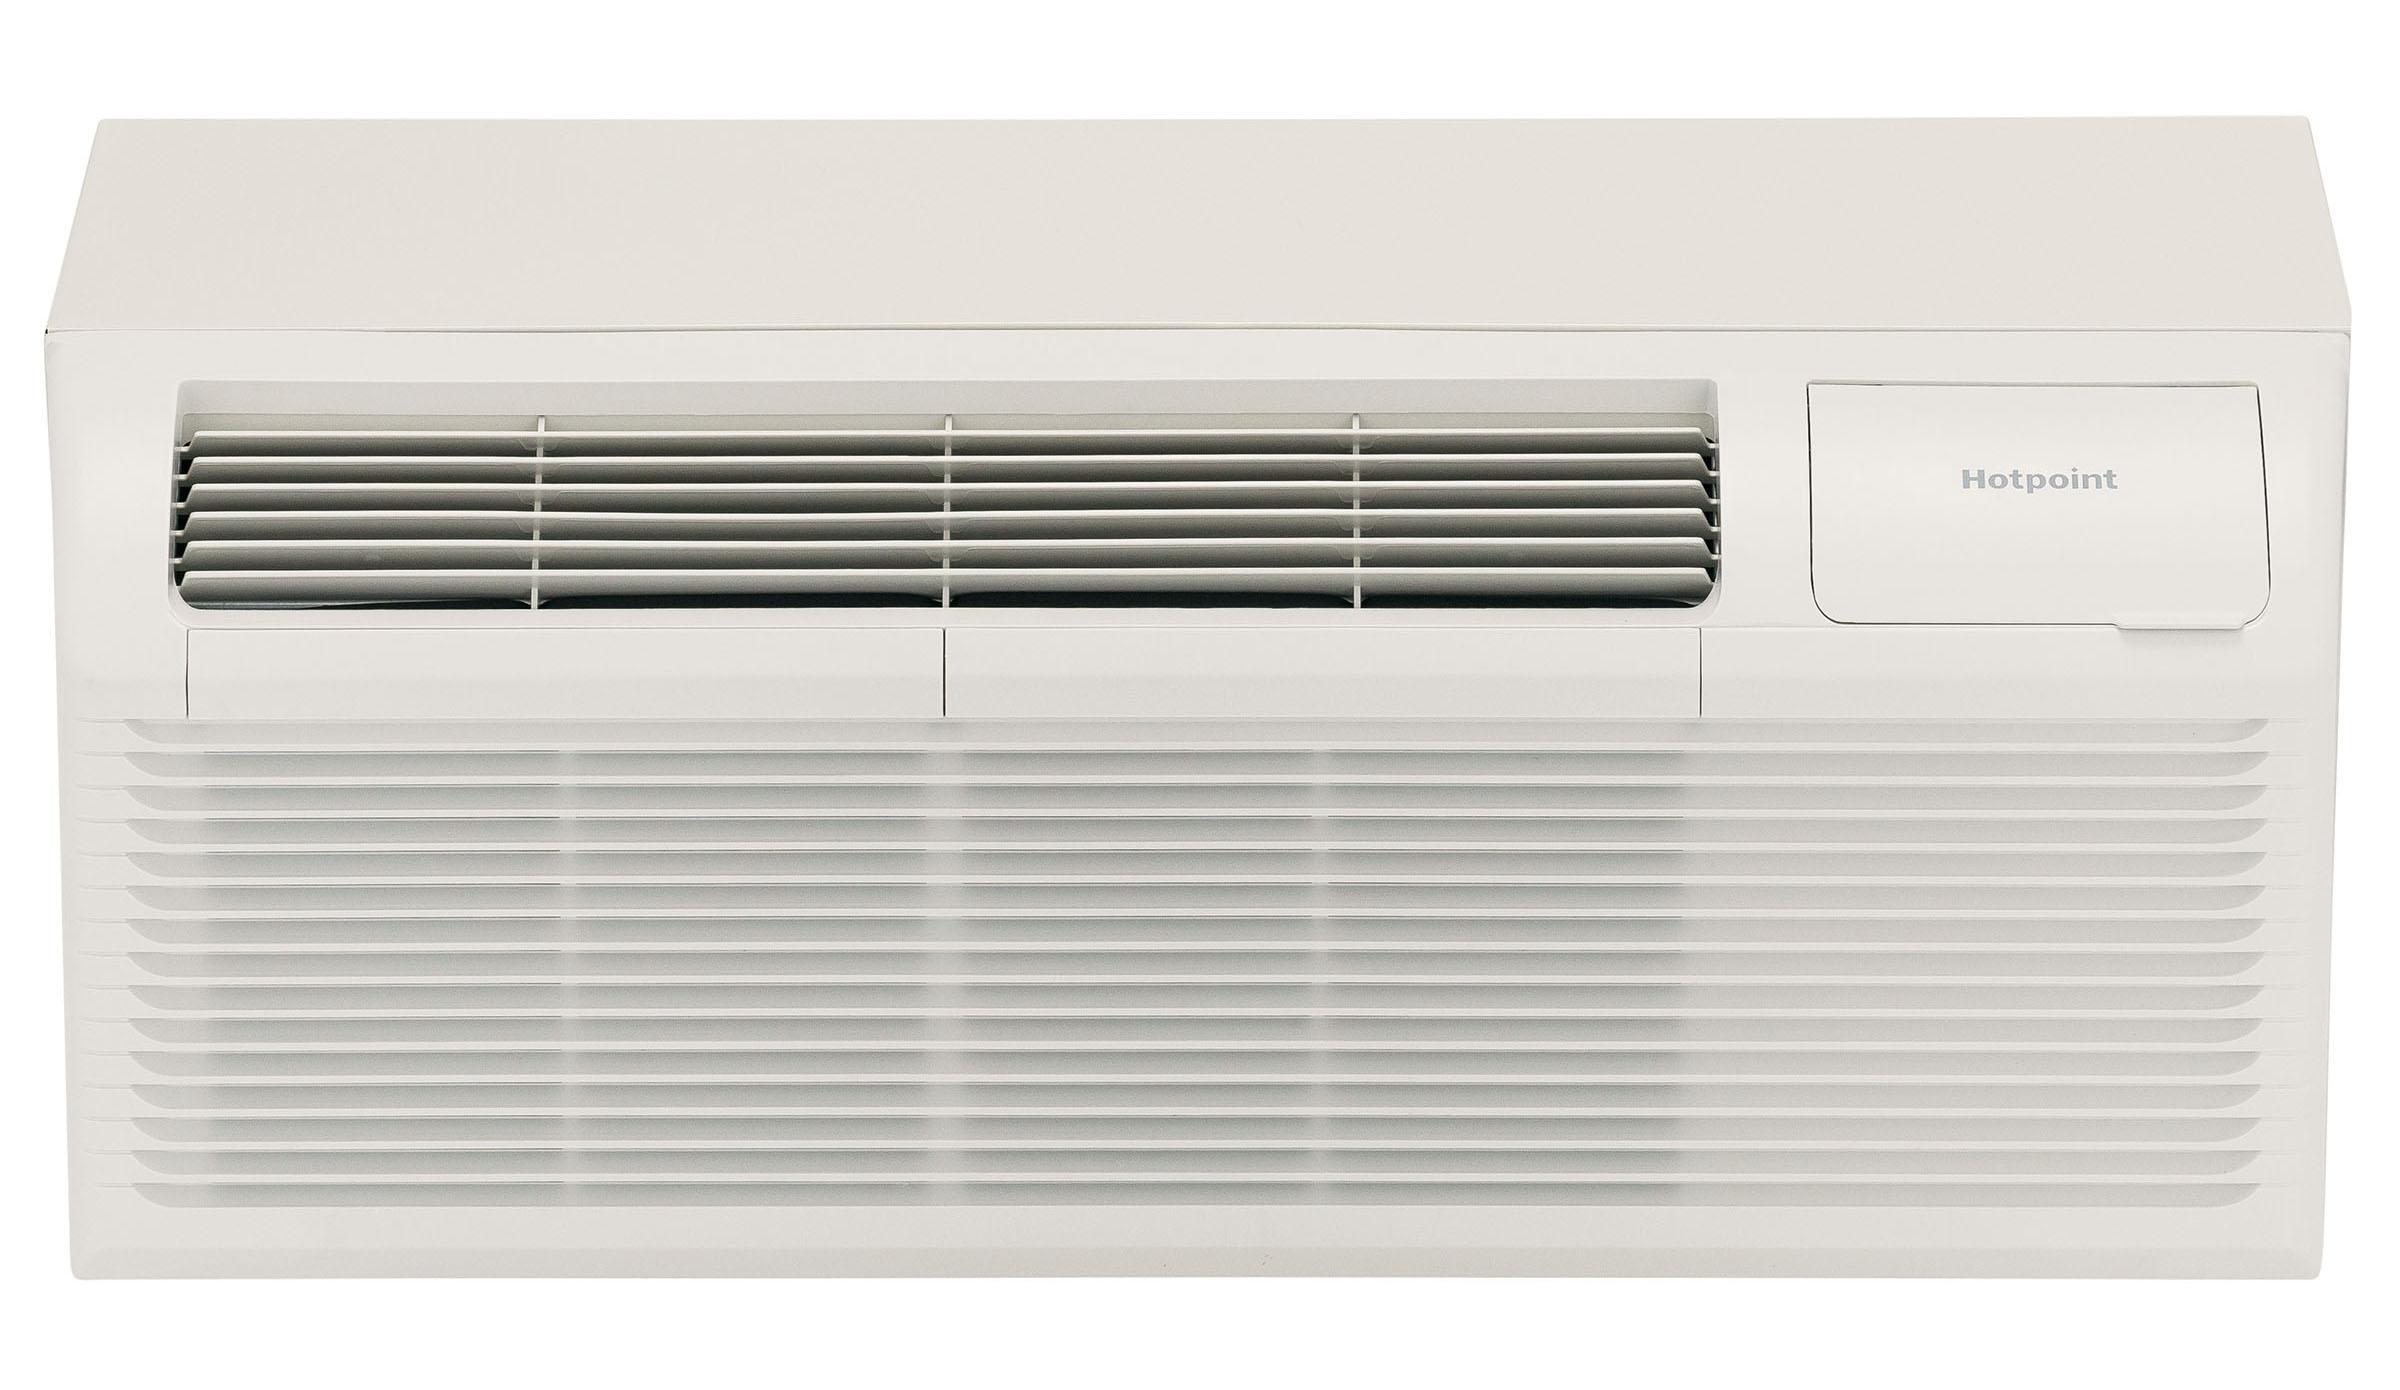 Hotpoint AH11H12D3B 12000 BTU PTAC Air Conditioner with Heat Pump - 20 Amp - 208/230 Volt